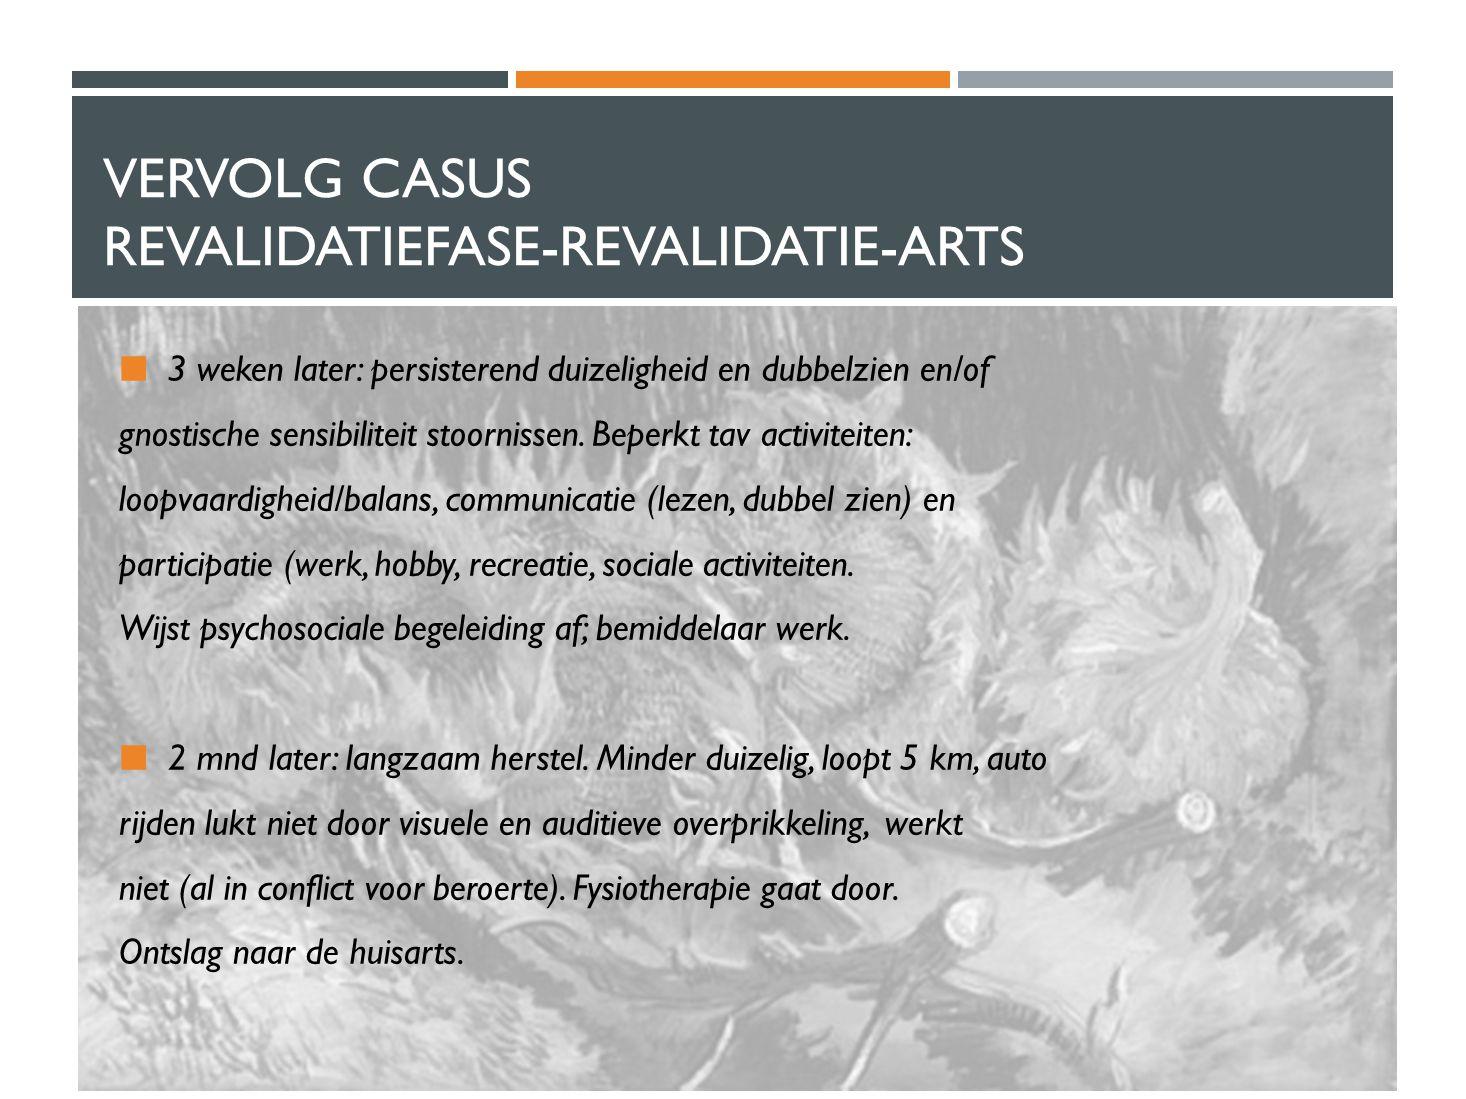 Vervolg casus Revalidatiefase-Revalidatie-arts